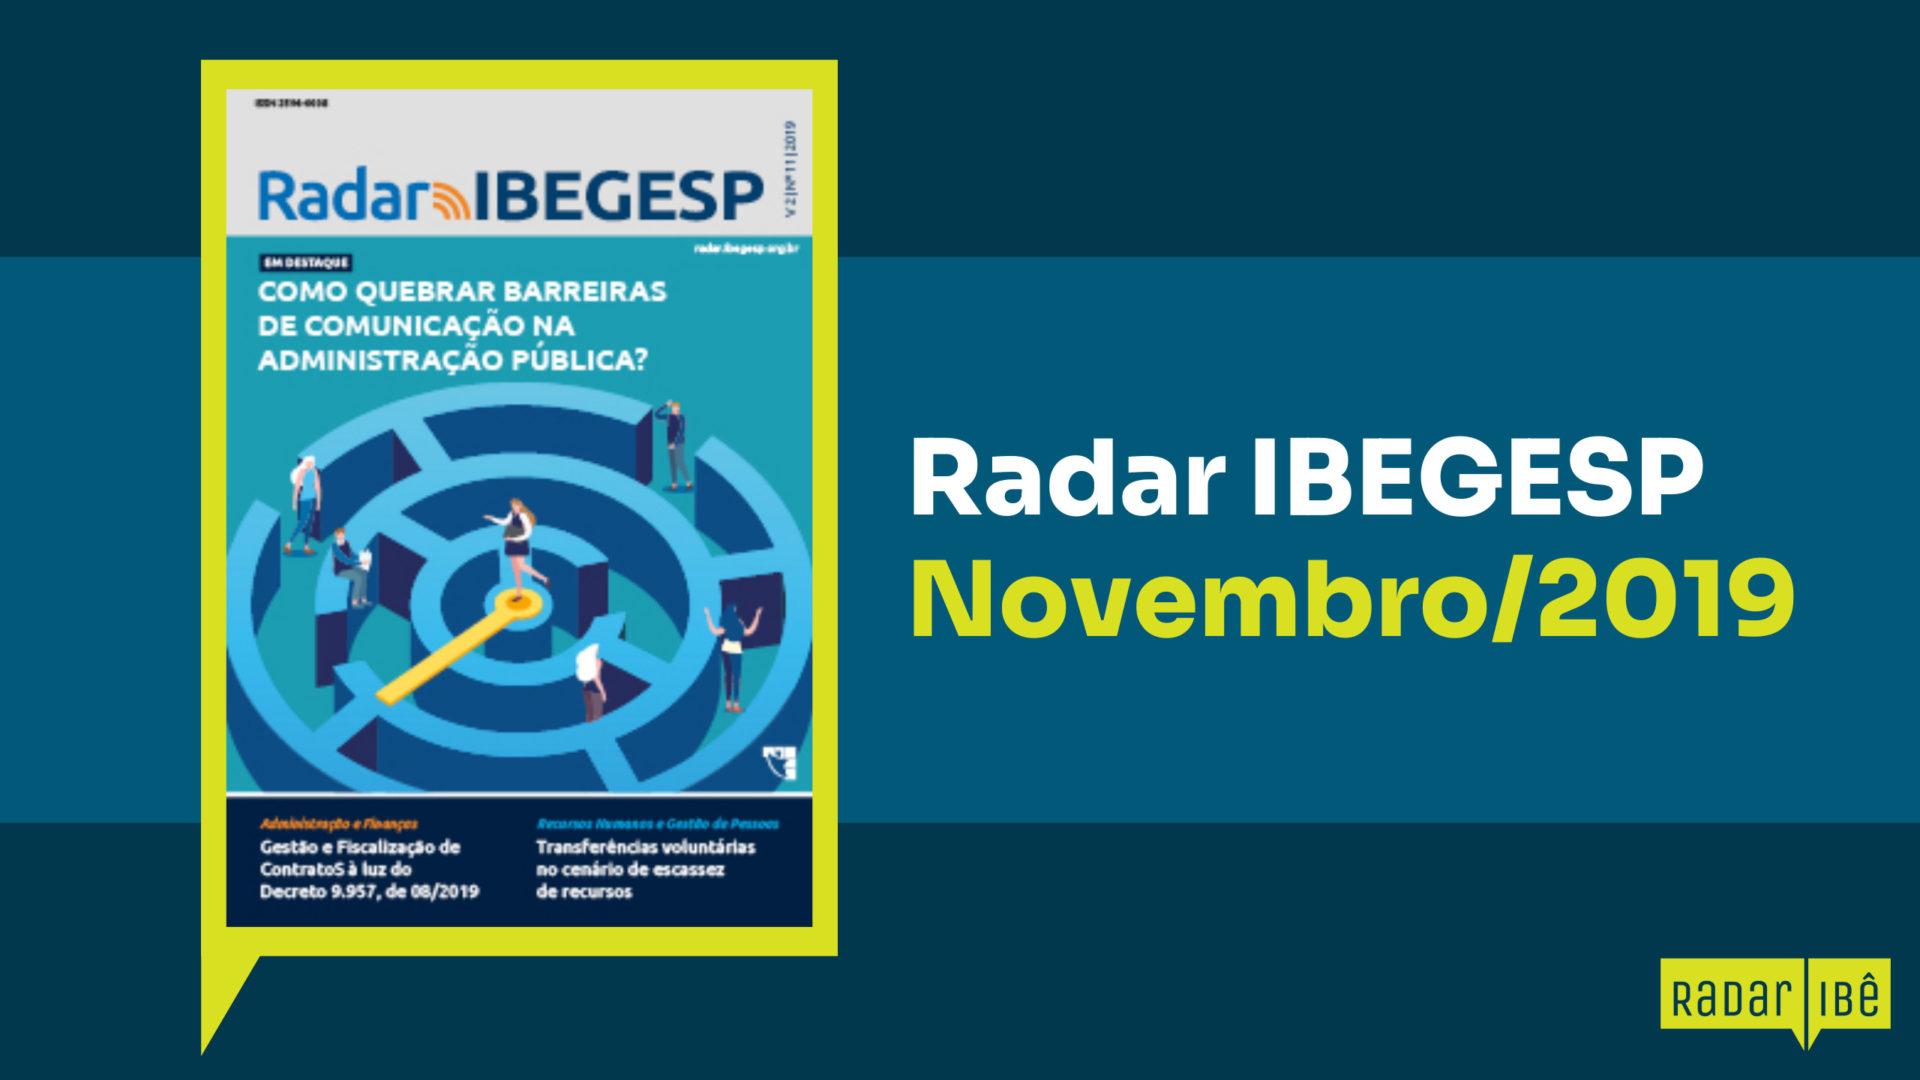 Radar IBEGESP Novembro de 2019